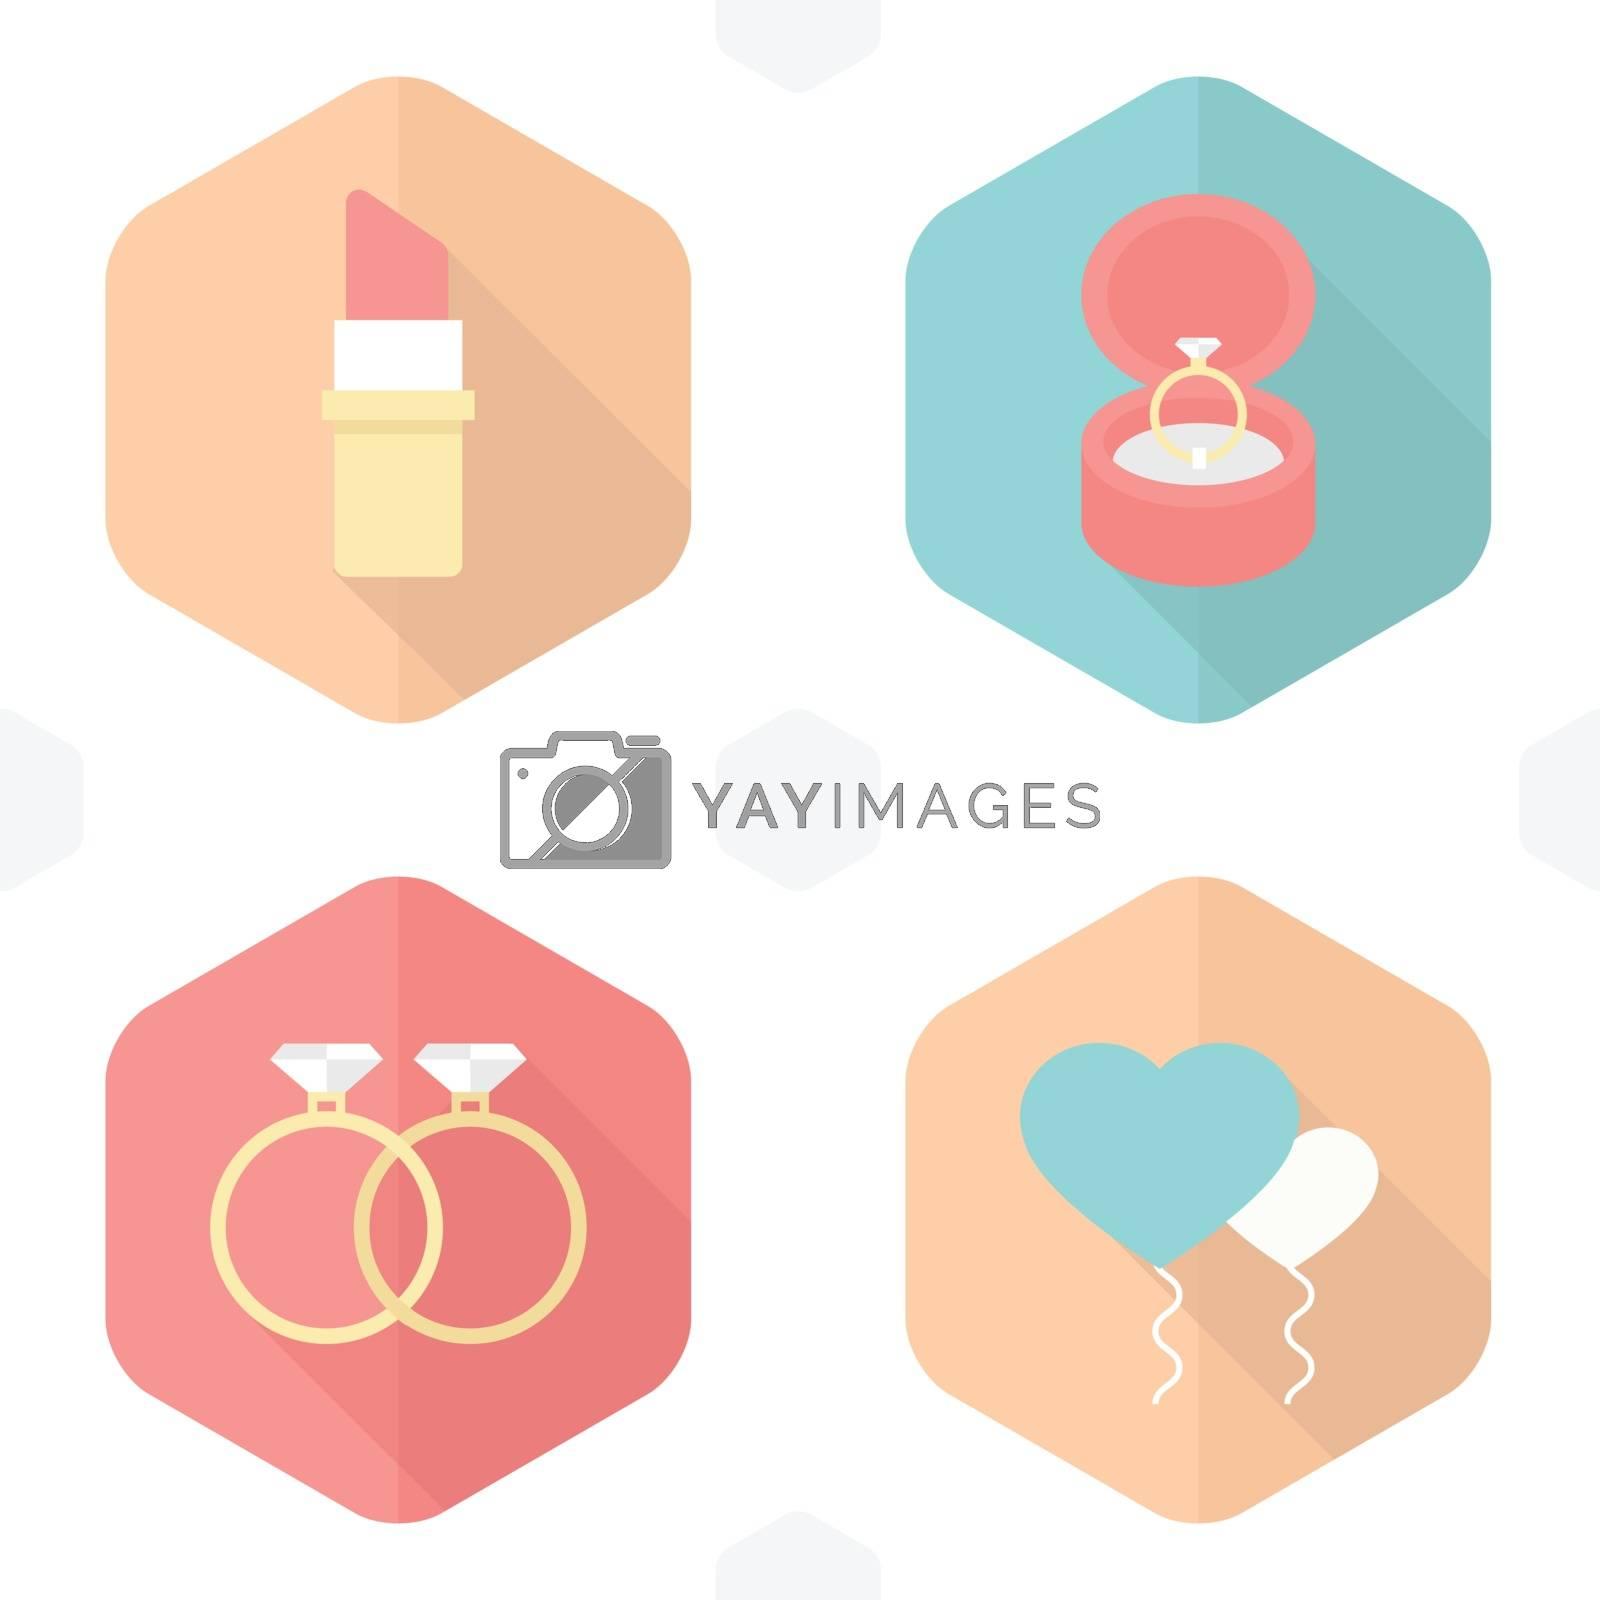 wedding symbols lipstick, rings, gifts, balloons,  Heart